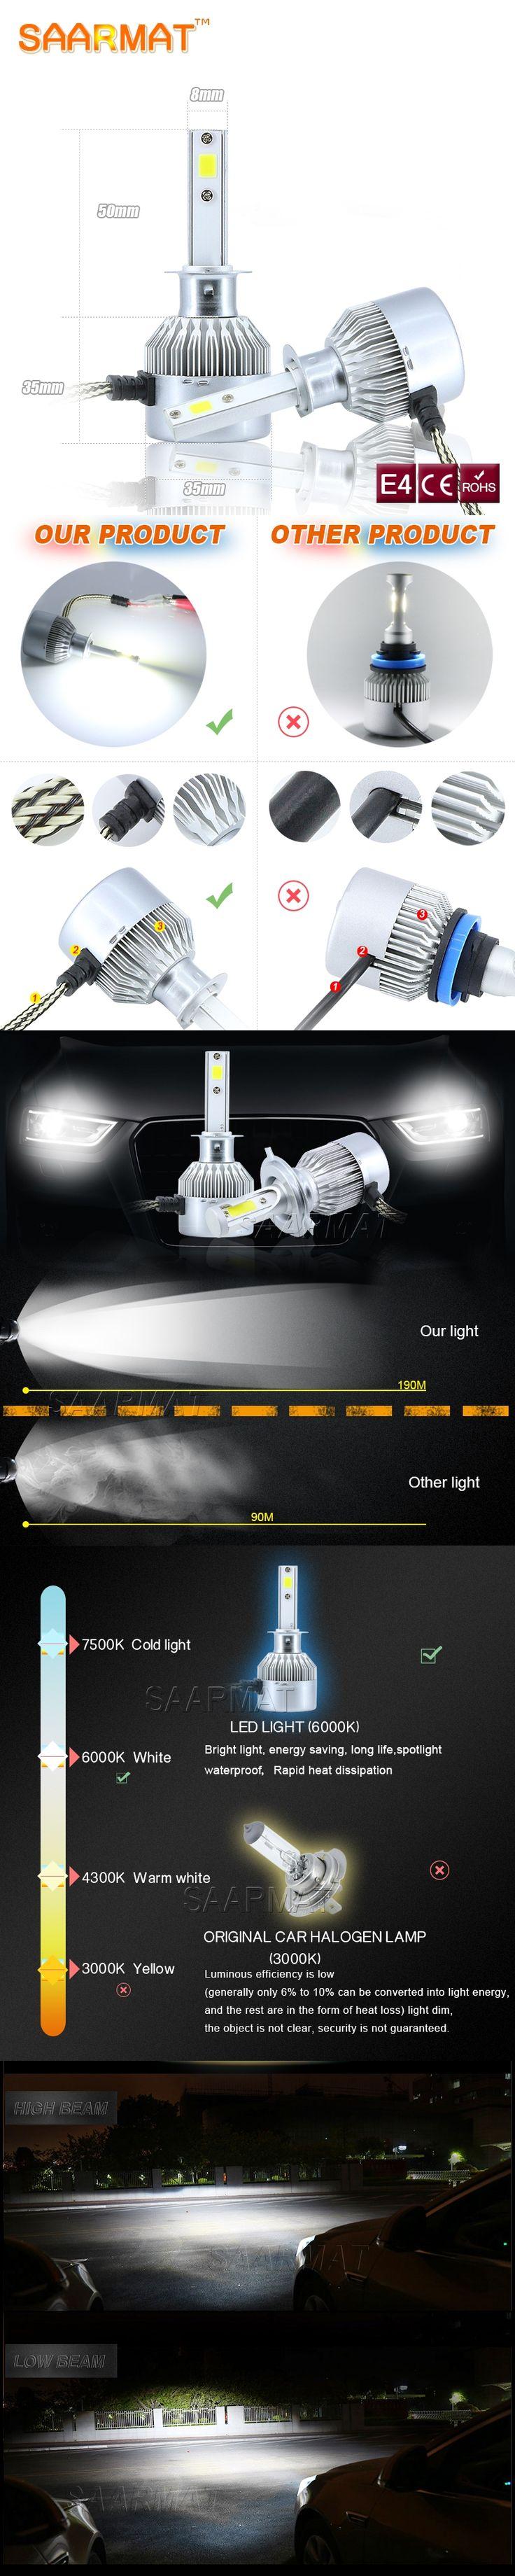 2X LED Car-styling H7 H1 H3 H4/HB2 H8/H11 9005/HB3 9006/HB4 H27/880/881 9012/HIR2 LED Headlight Bulb Head Lamp Fog Light 6000K